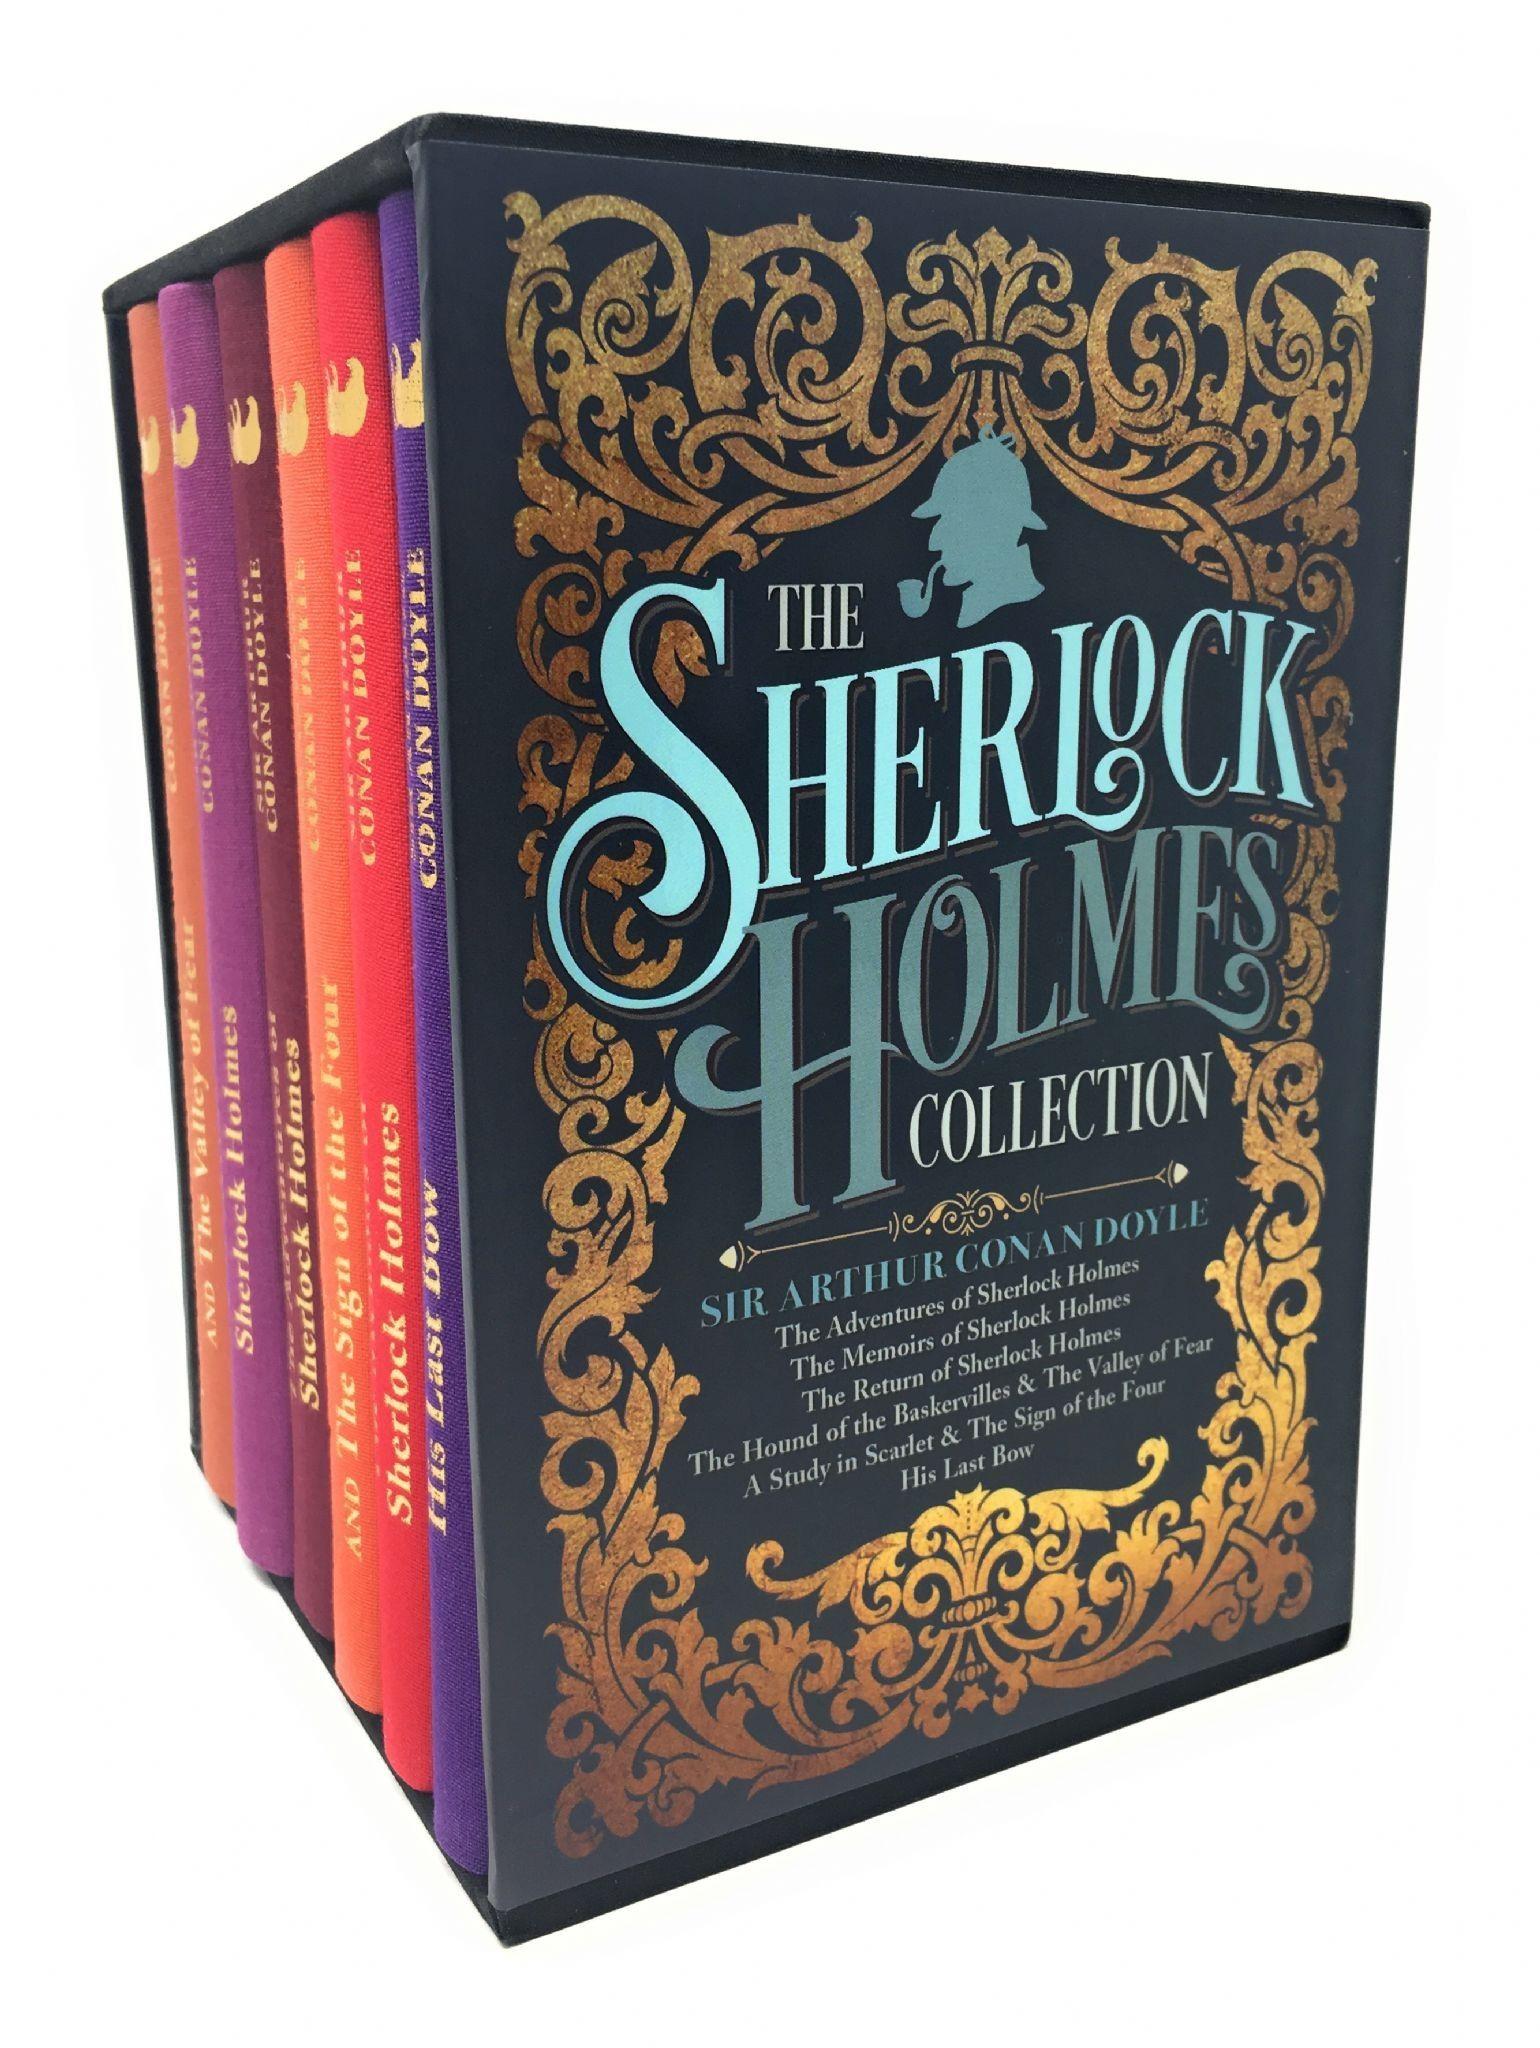 The Sherlock Holmes Collection By Sir Arthur Conan Doyle 6 Books Box Set Sherlock Holmes Book Sir Arthur Conan Doyle Sherlock Holmes